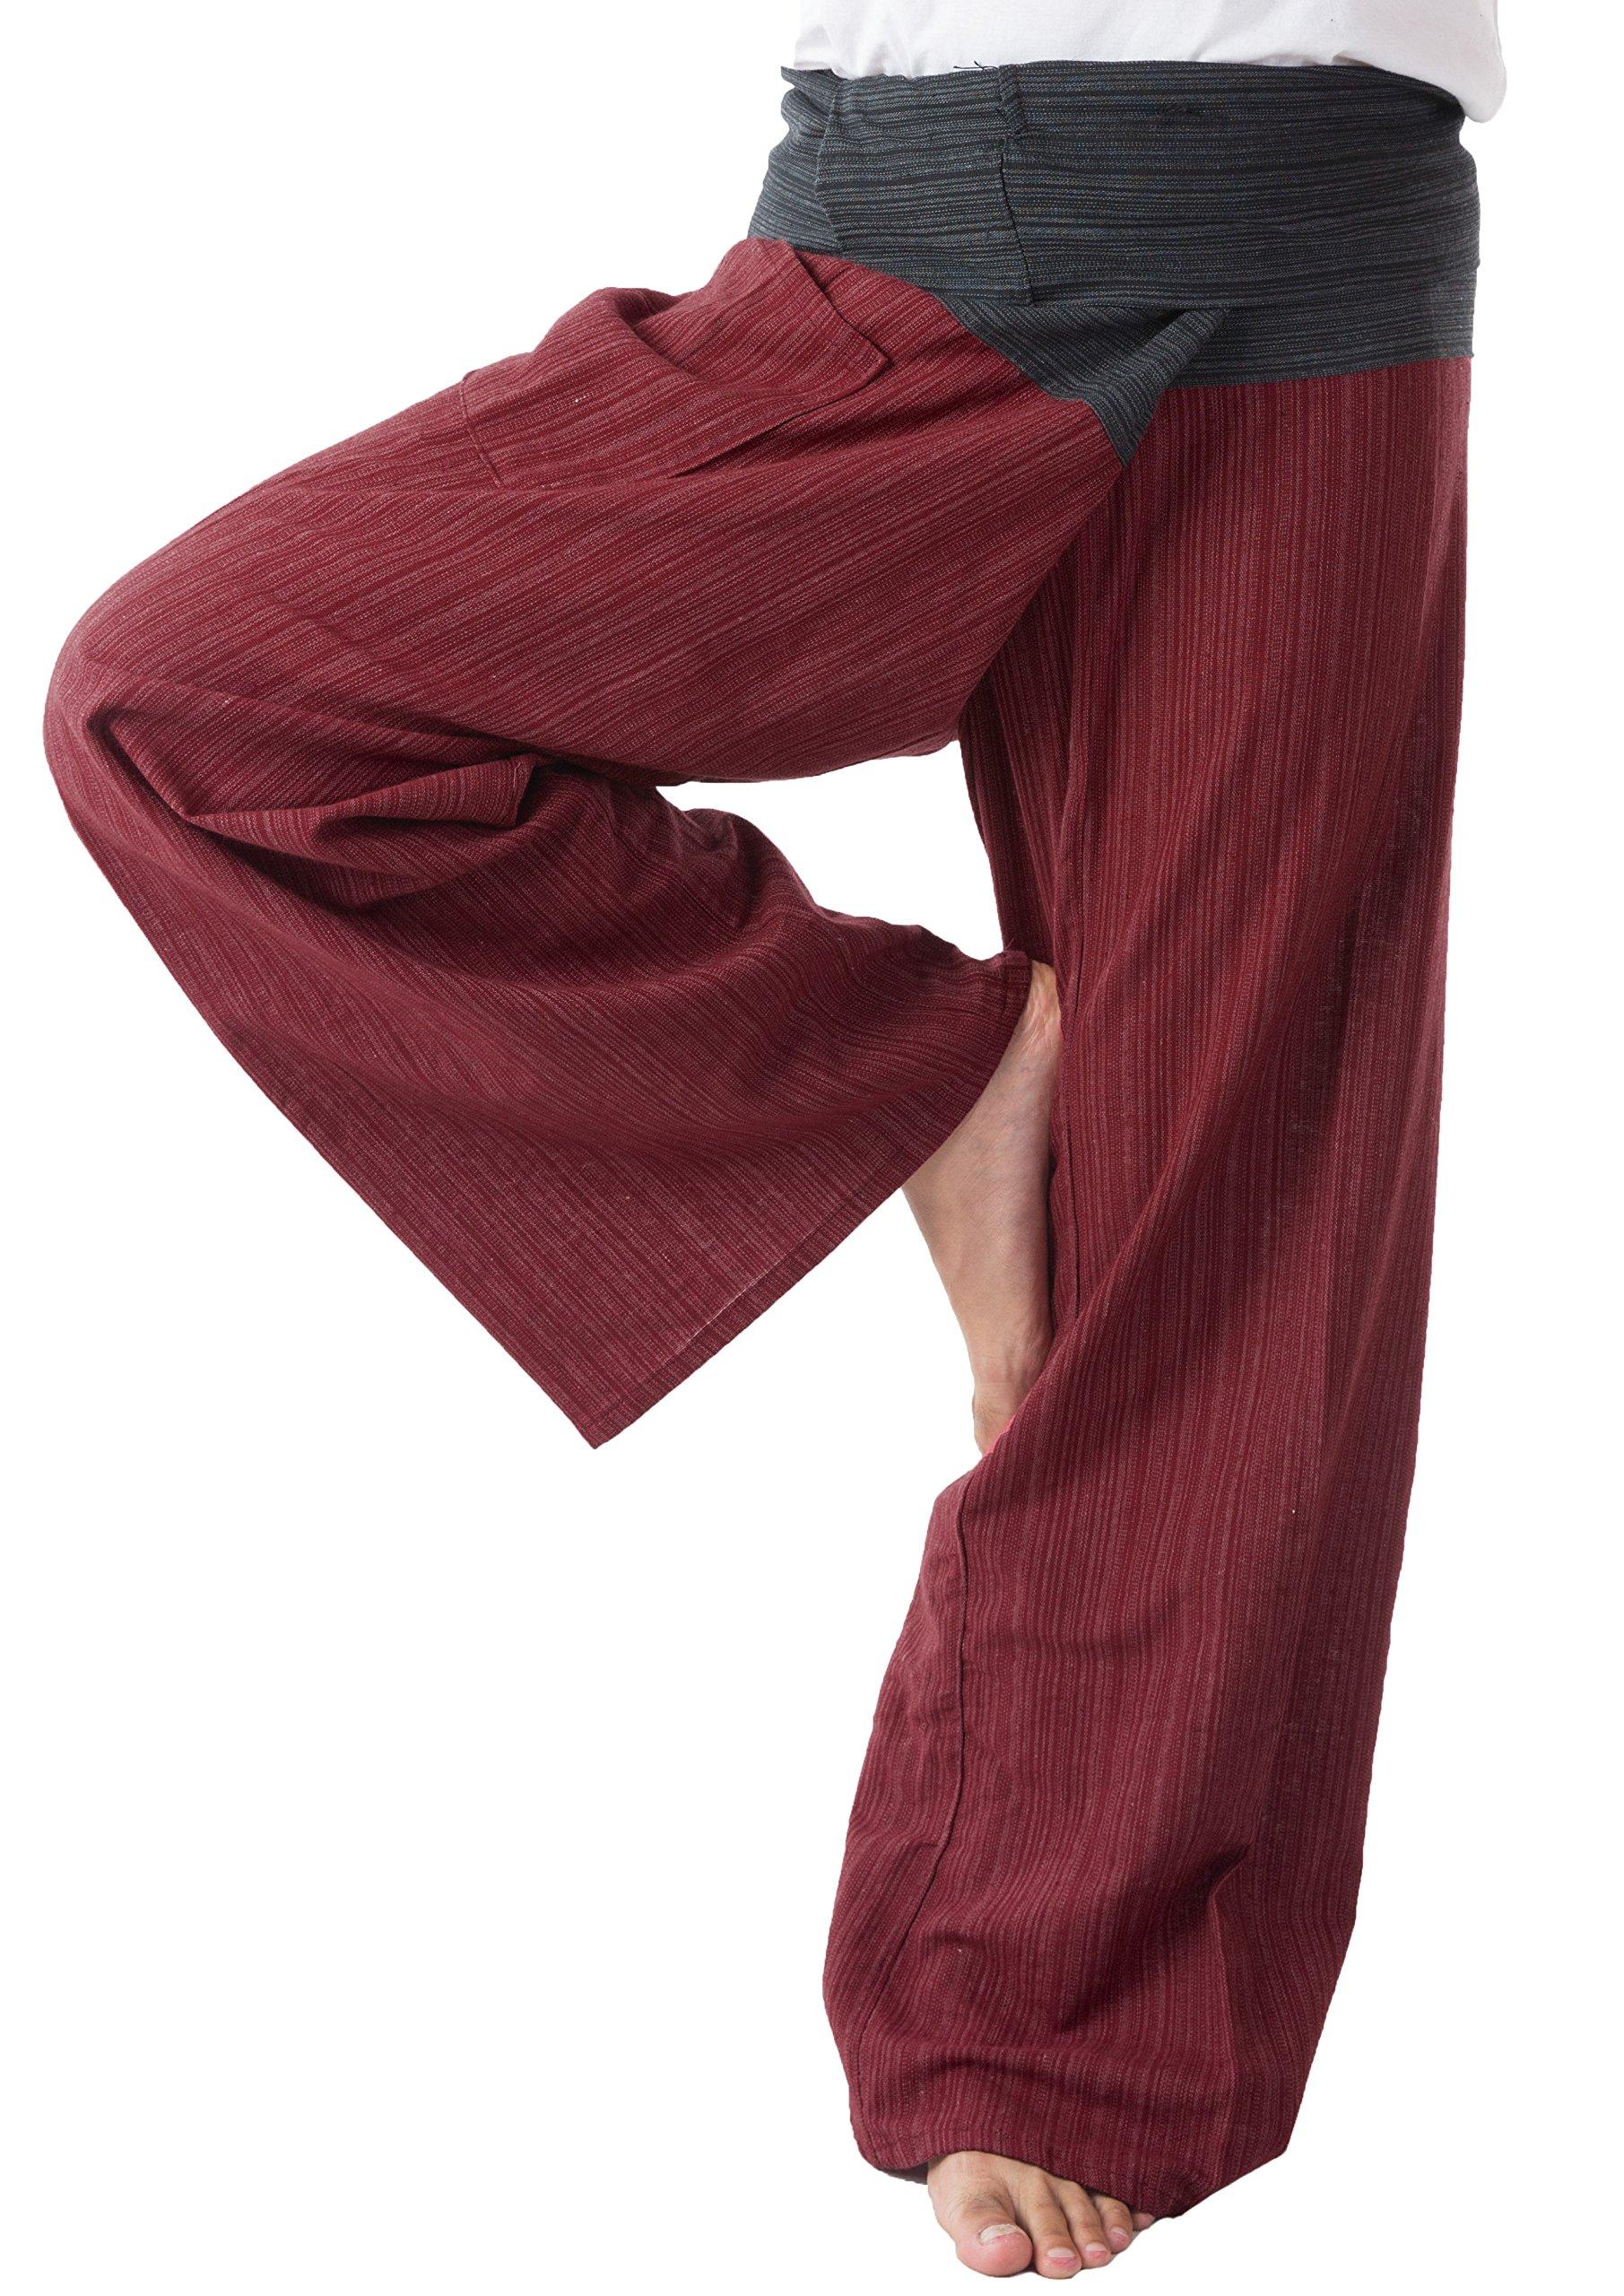 Thai Fisherman Pants Men's Yoga Trousers Black and Red 2 Tone Pant